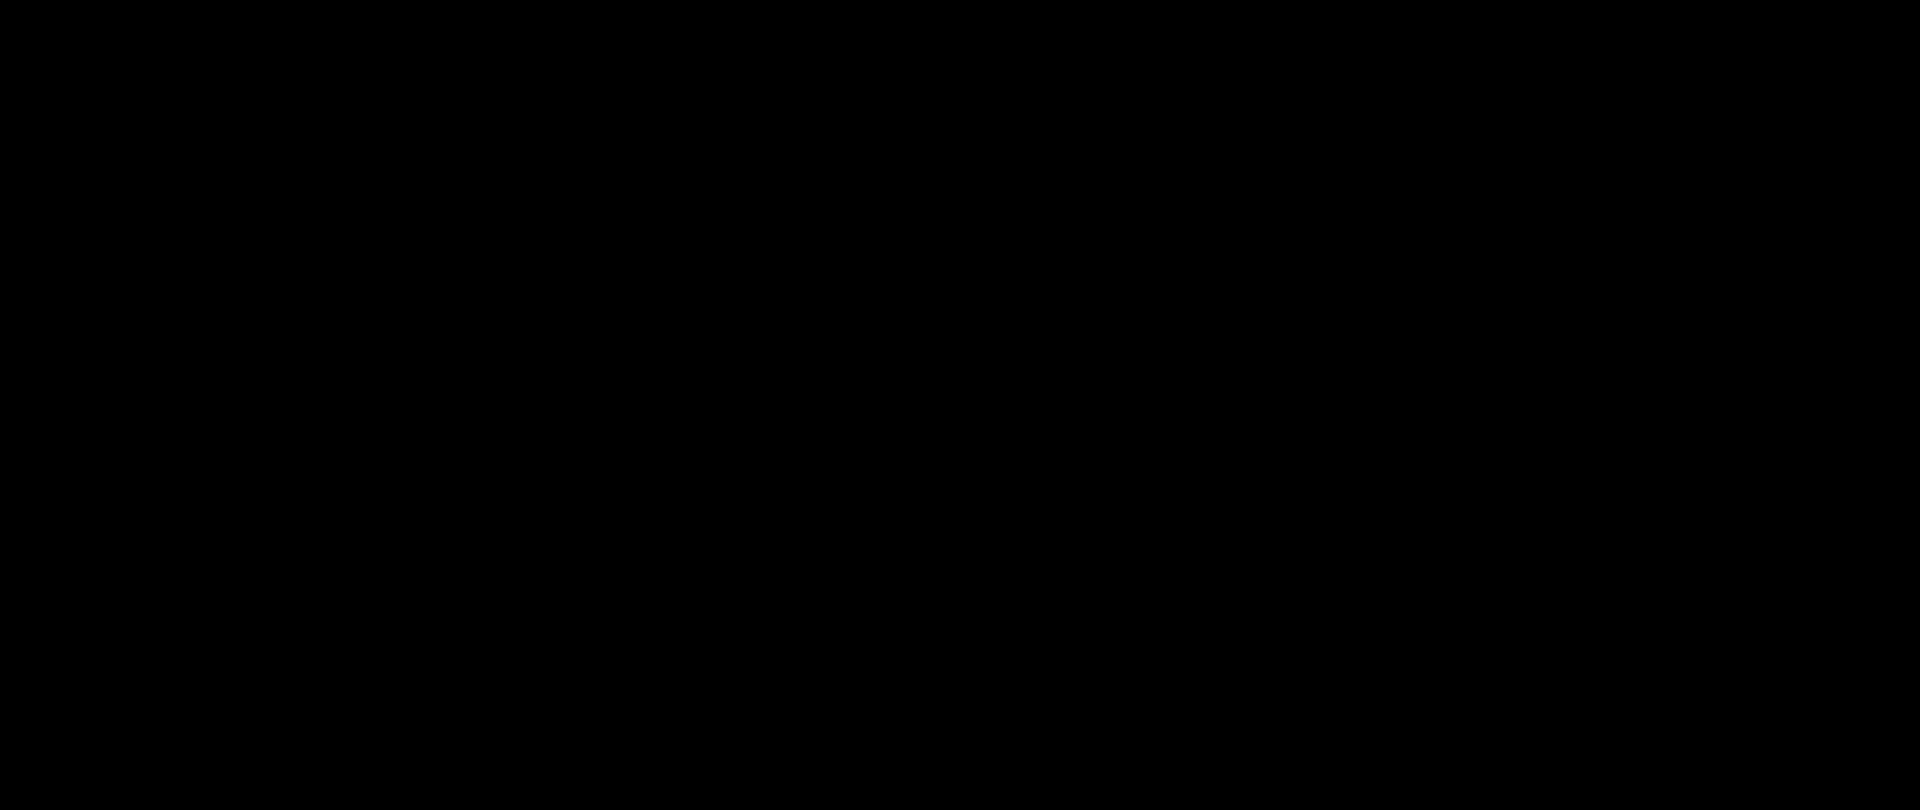 GTA Online REBL Highlights   Crew Content GIFs